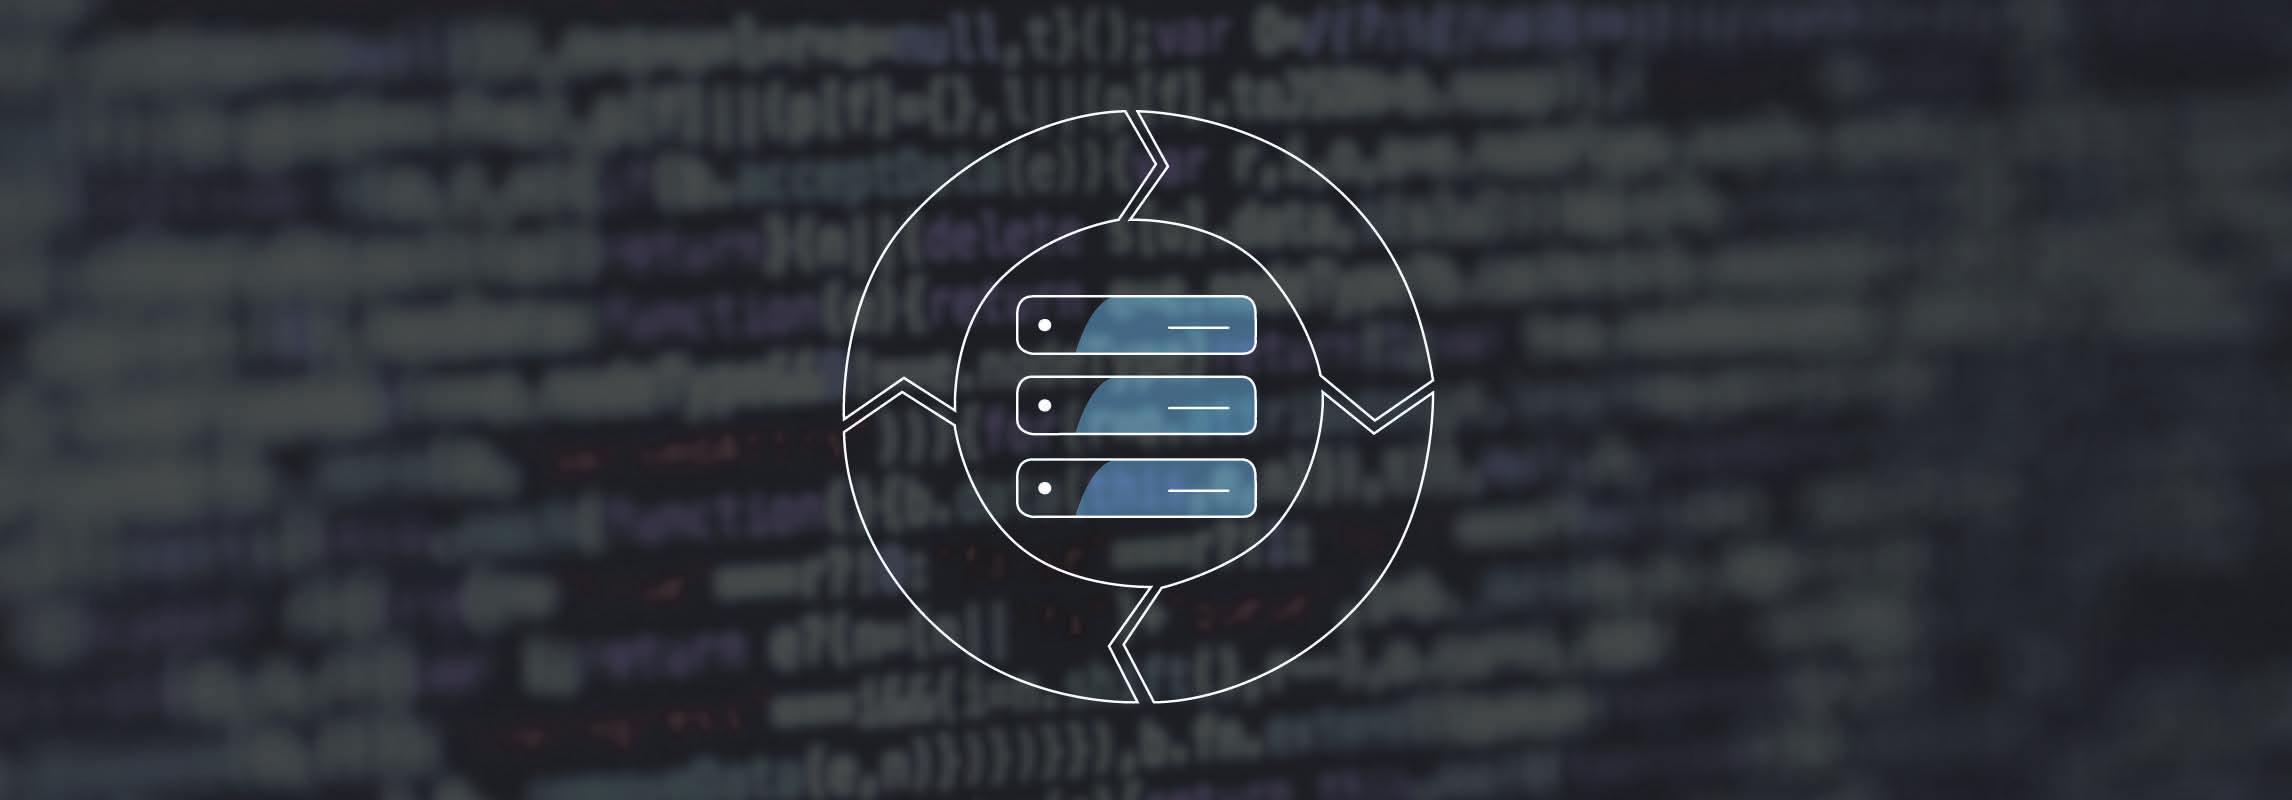 Master Data Life Cycle Icon auf Programmiercode